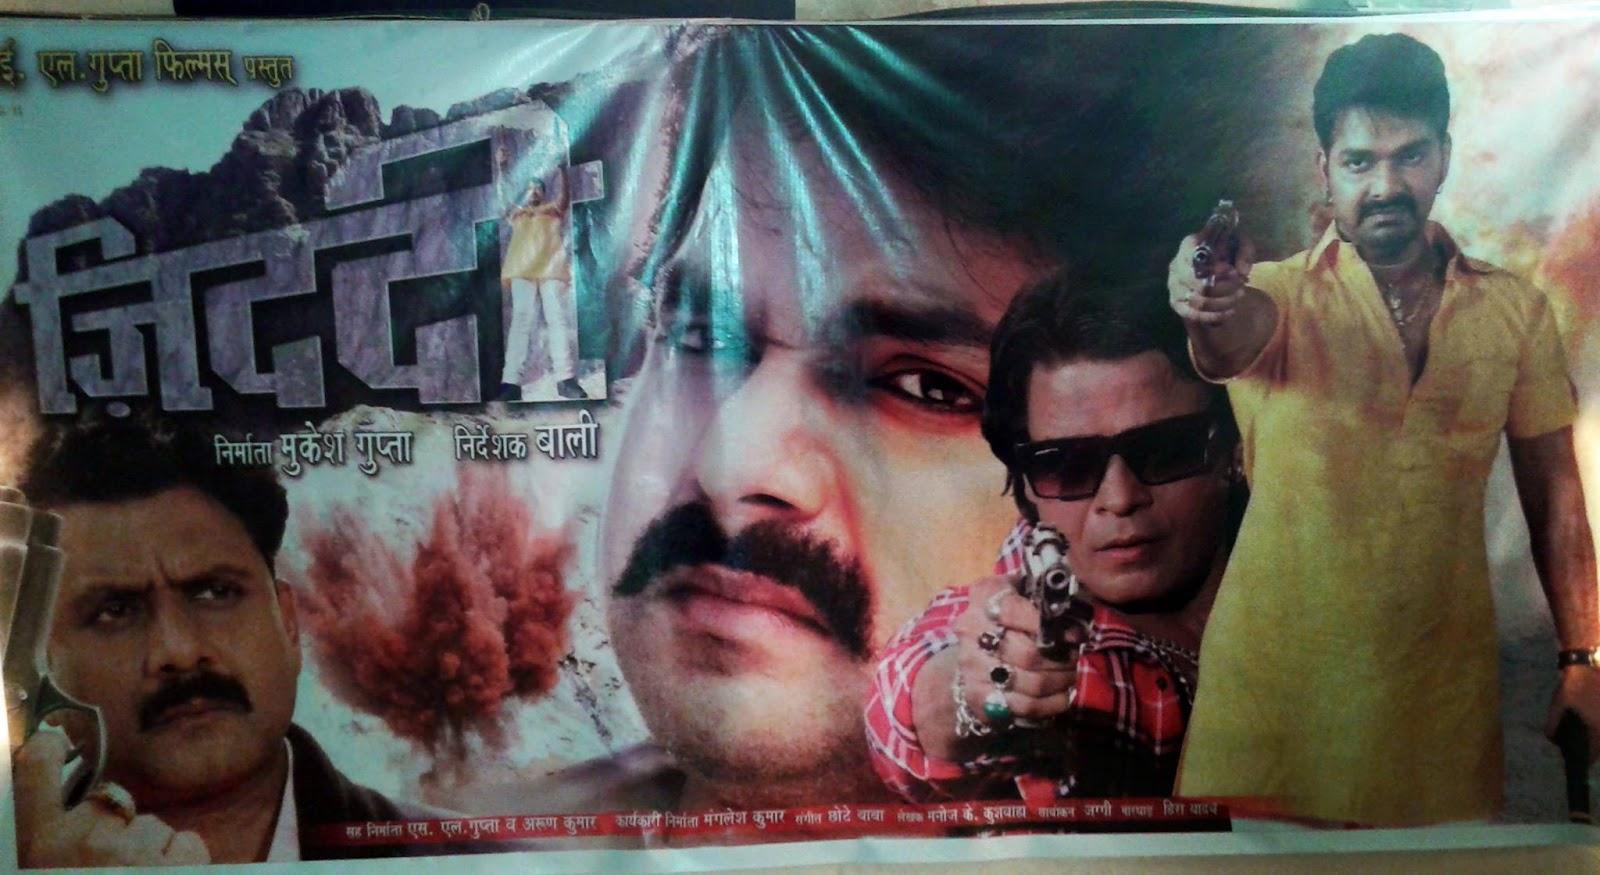 Ziddi Bhojpuri Film Poster